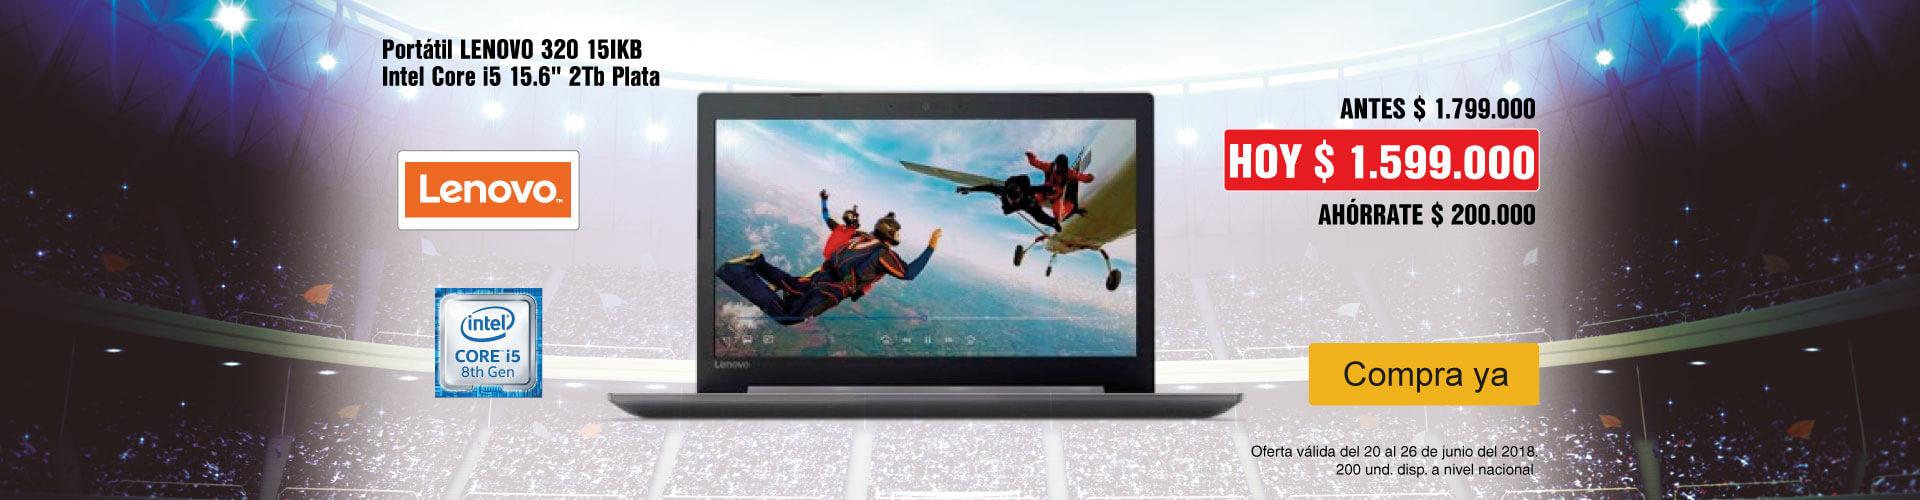 KT-PPAL-3-computadores y tablets-PP---Lenovo-320-15IKB-Jun20